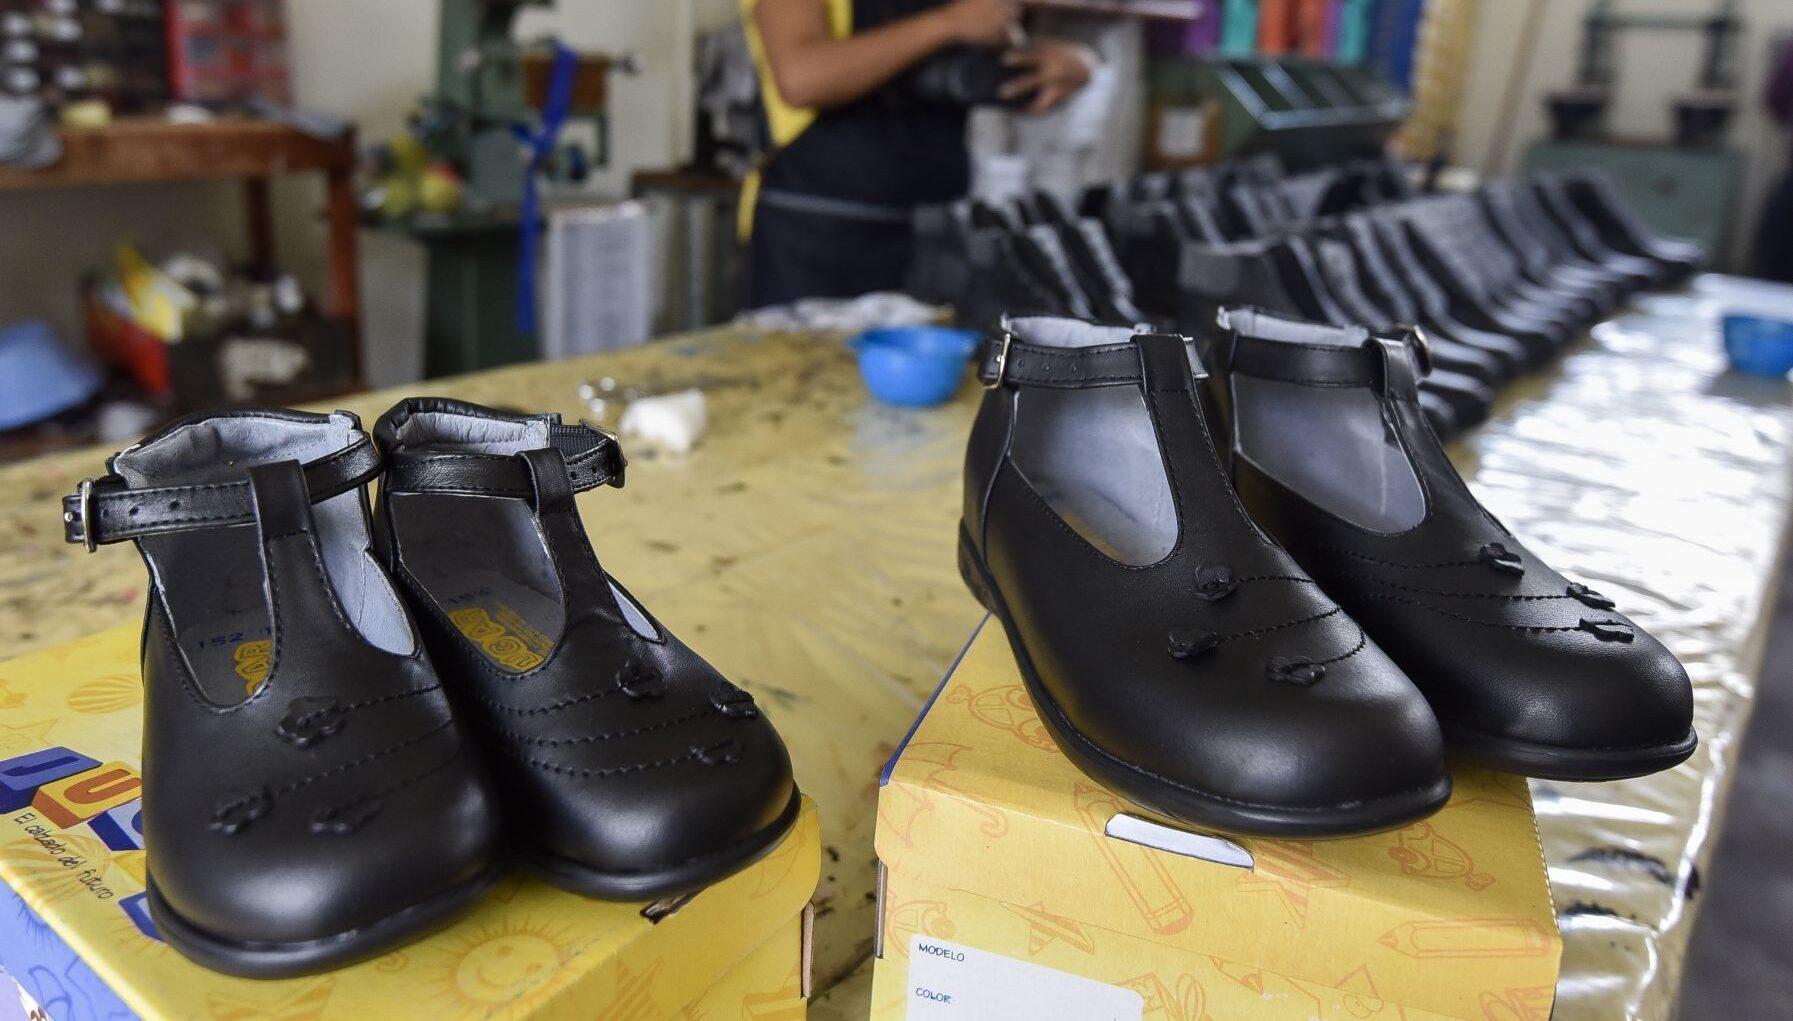 Iztapalapa dará zapatos escolares gratis a alumnos de primaria y secundaria